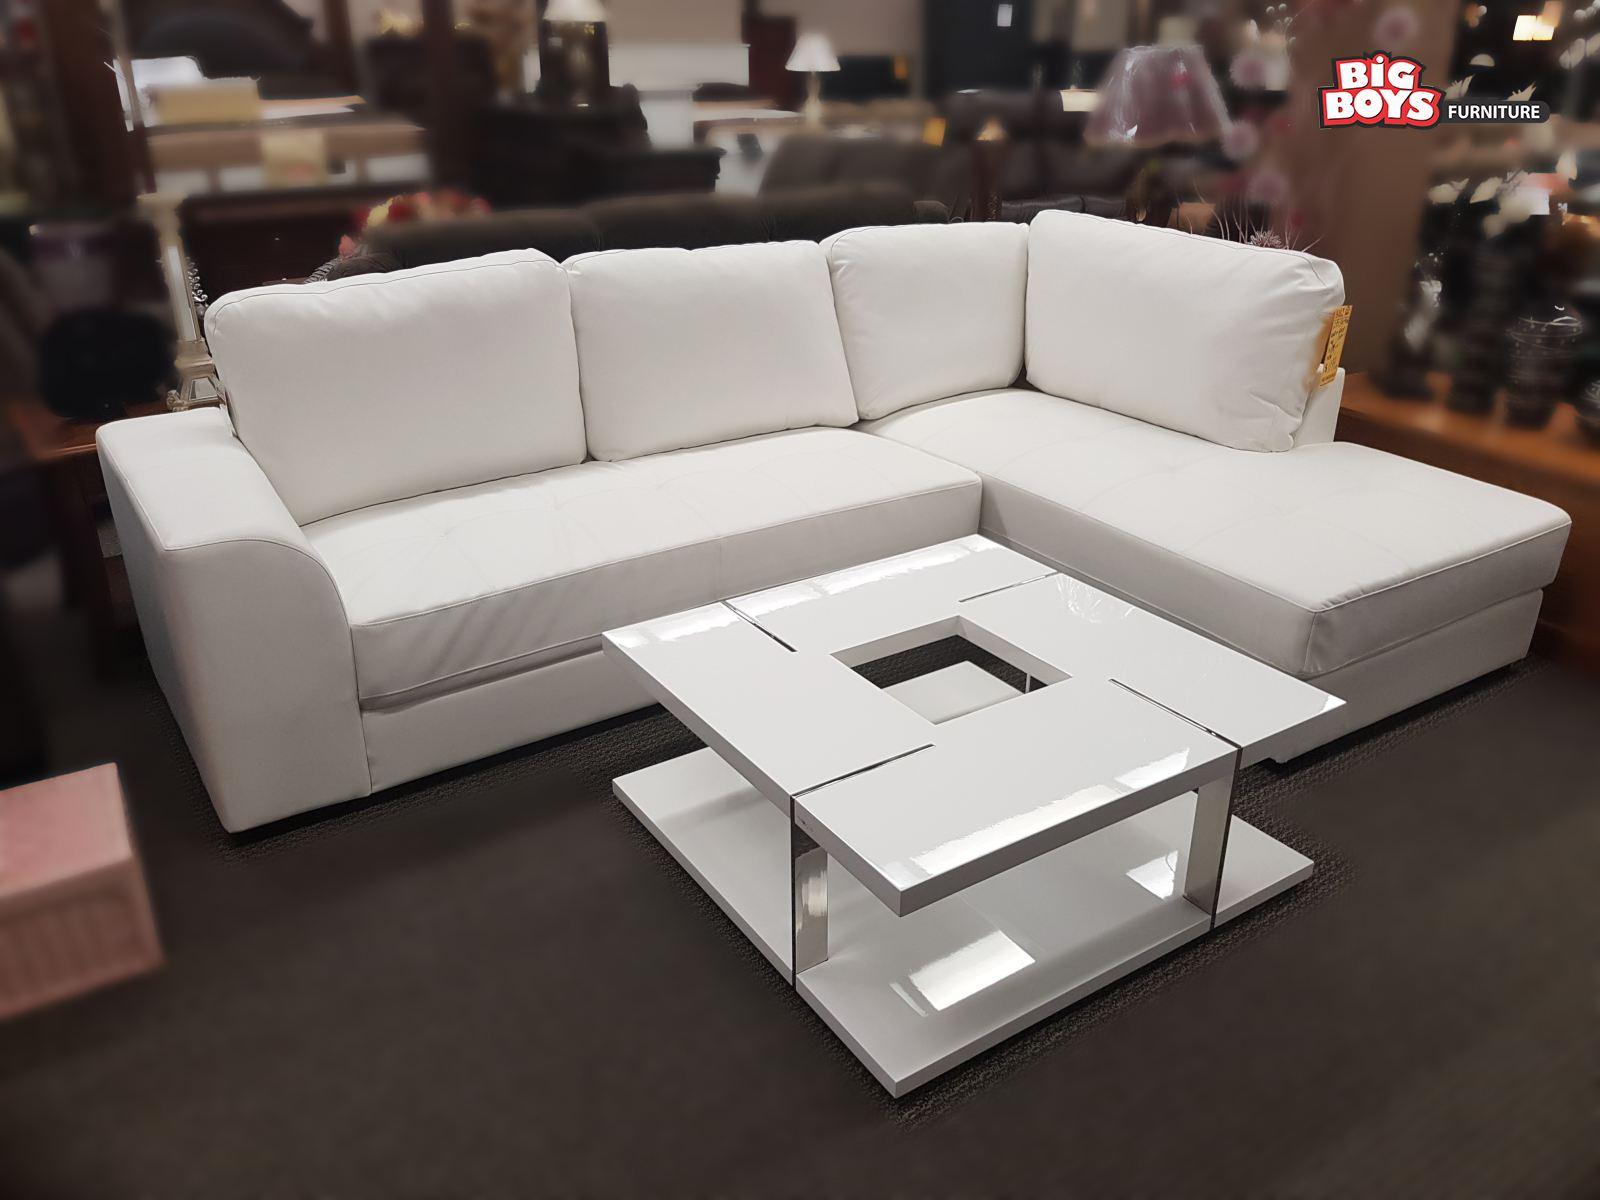 Big Boys Furniture is the biggest showroom in the region